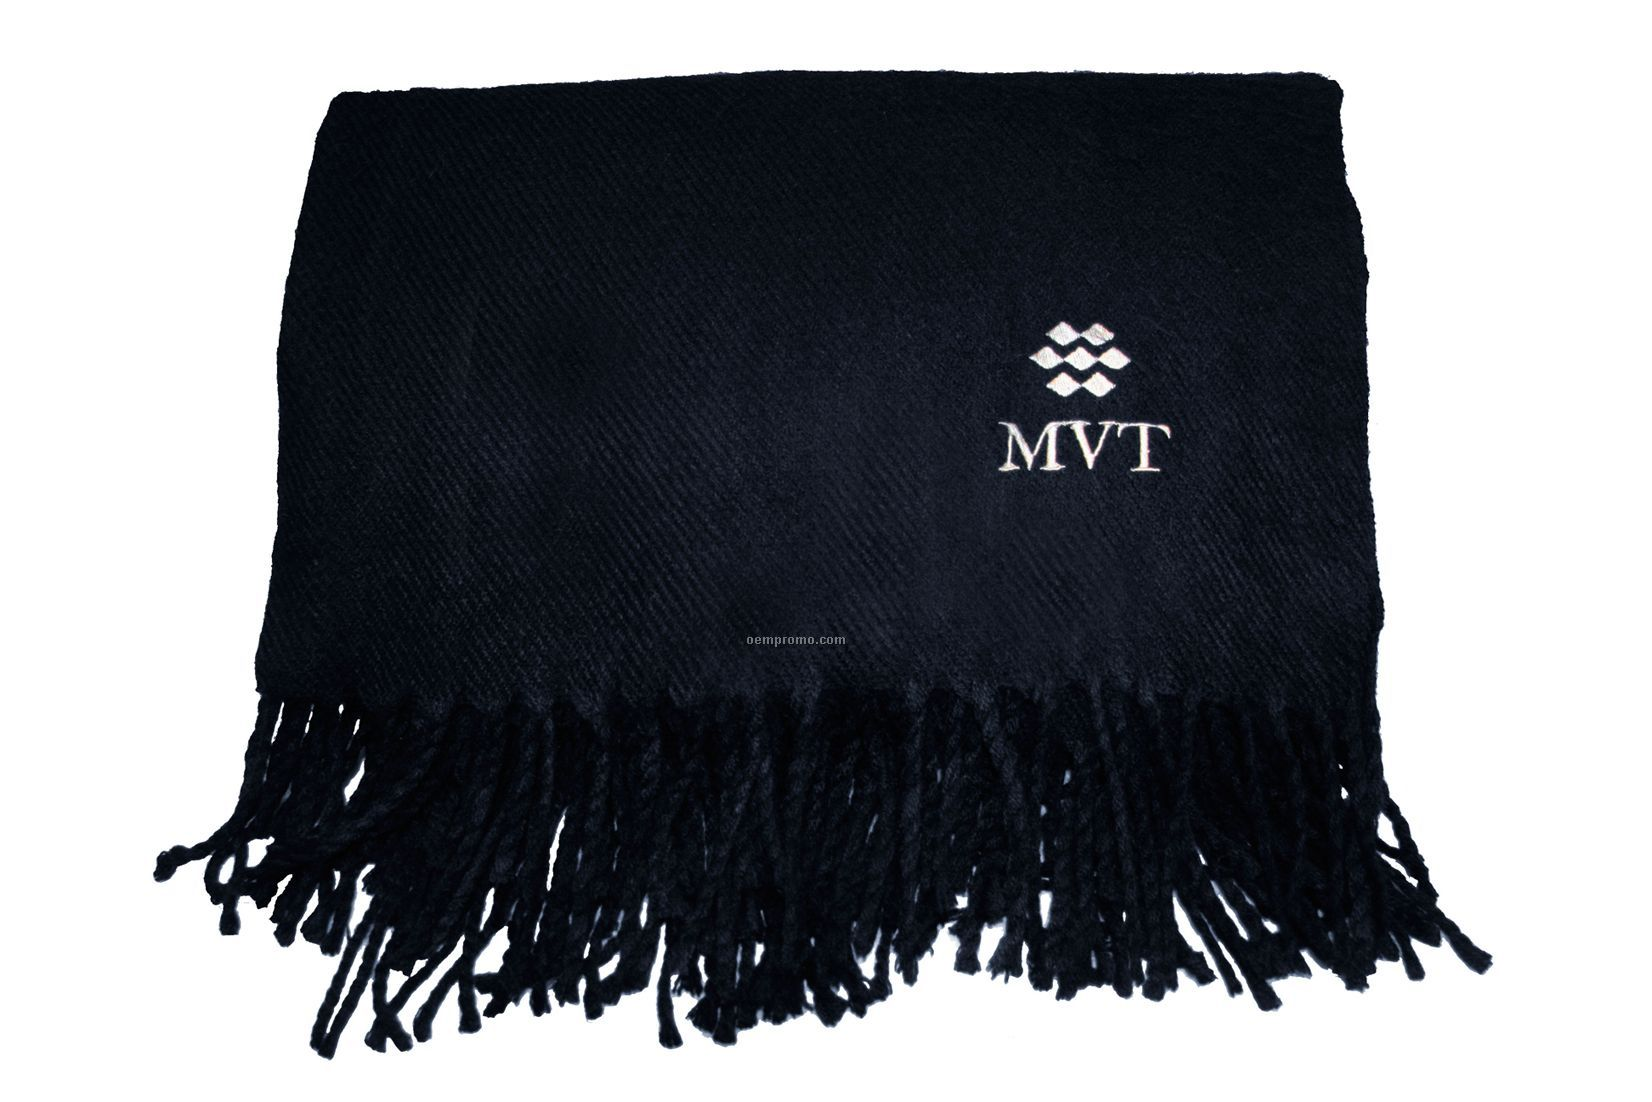 Tuxedo Black Studio Throw Blanket